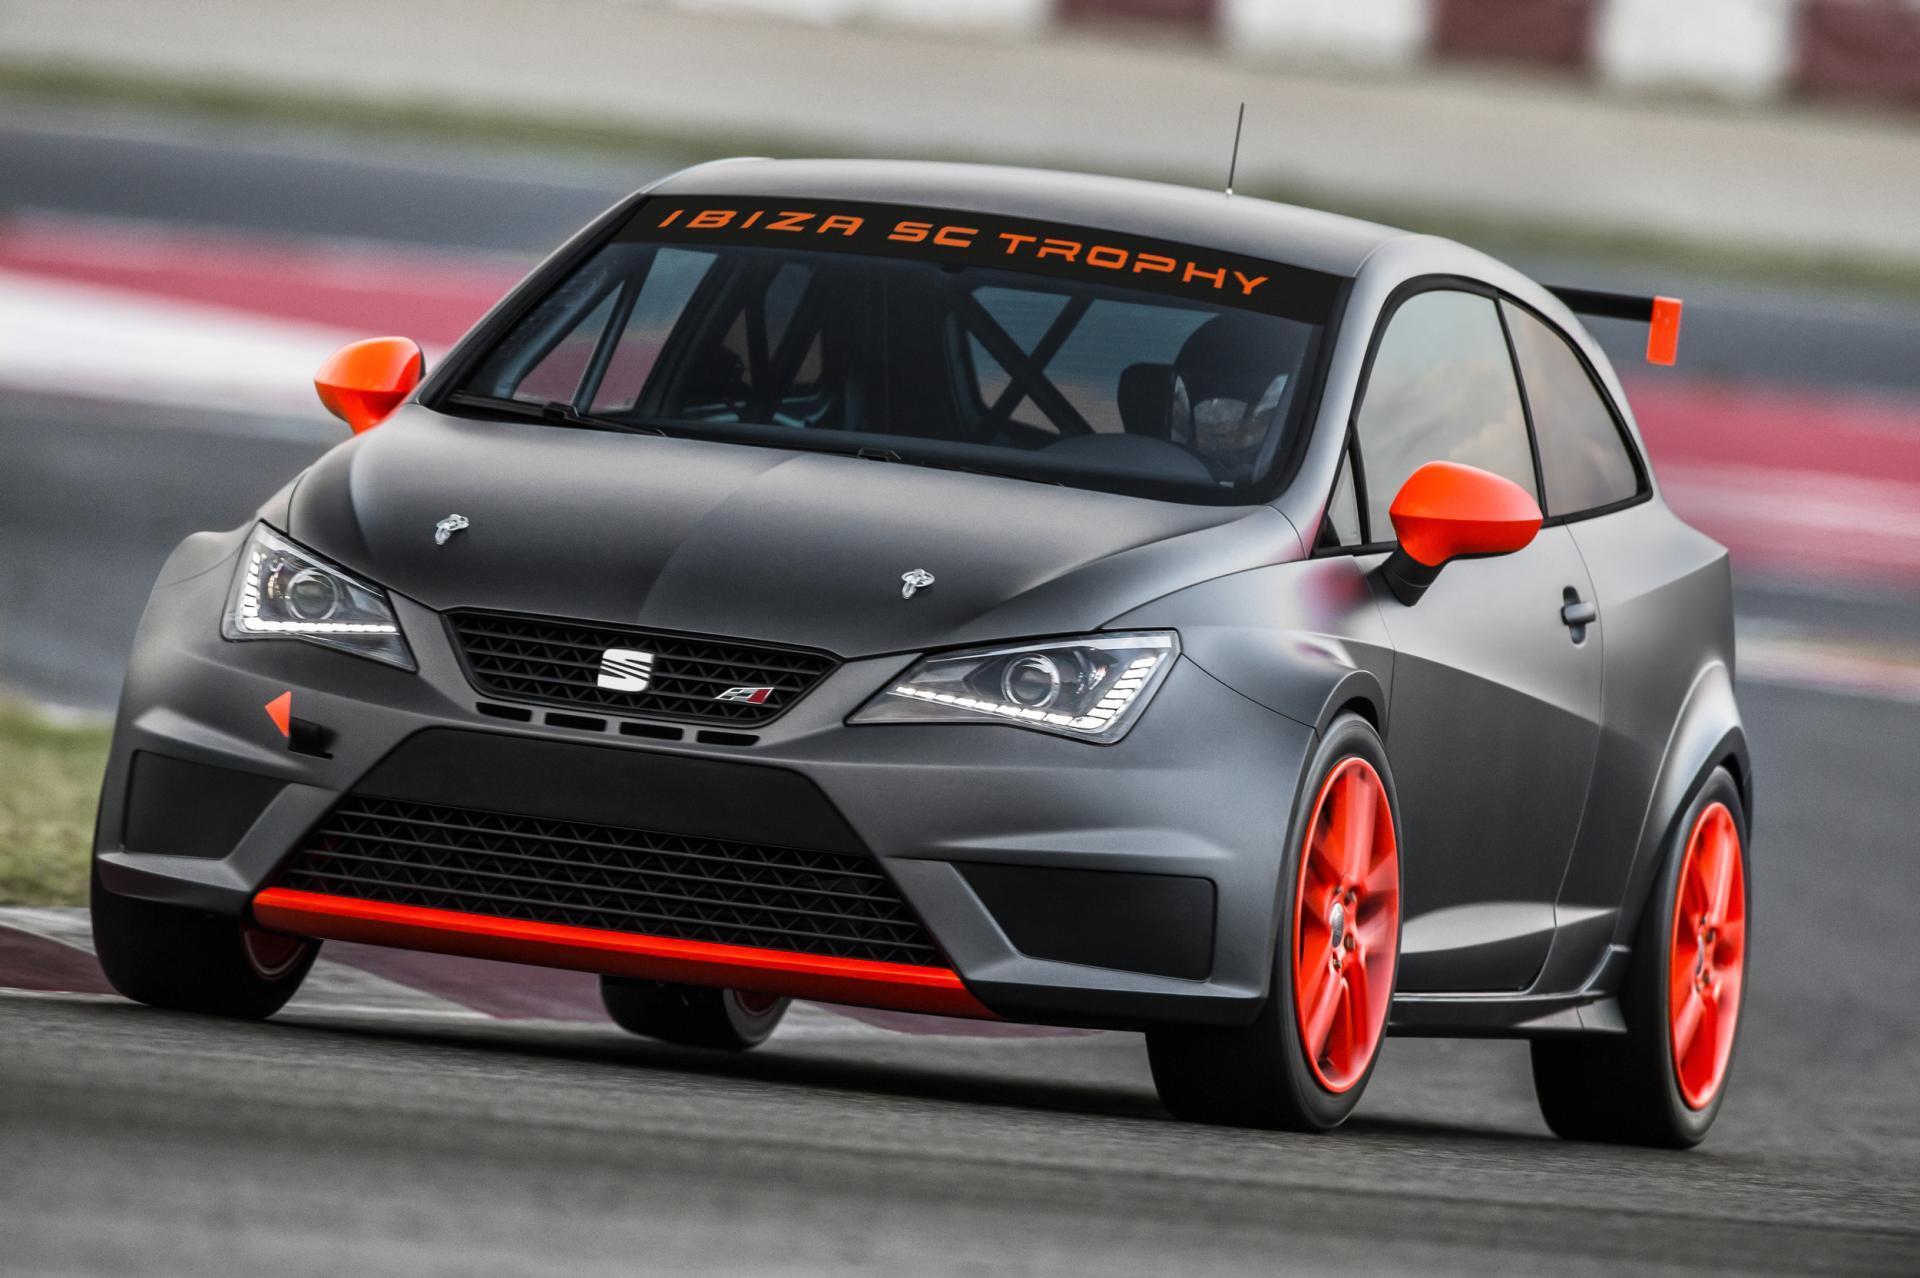 2013 Seat Ibiza SC Trophy - conceptcarz.com